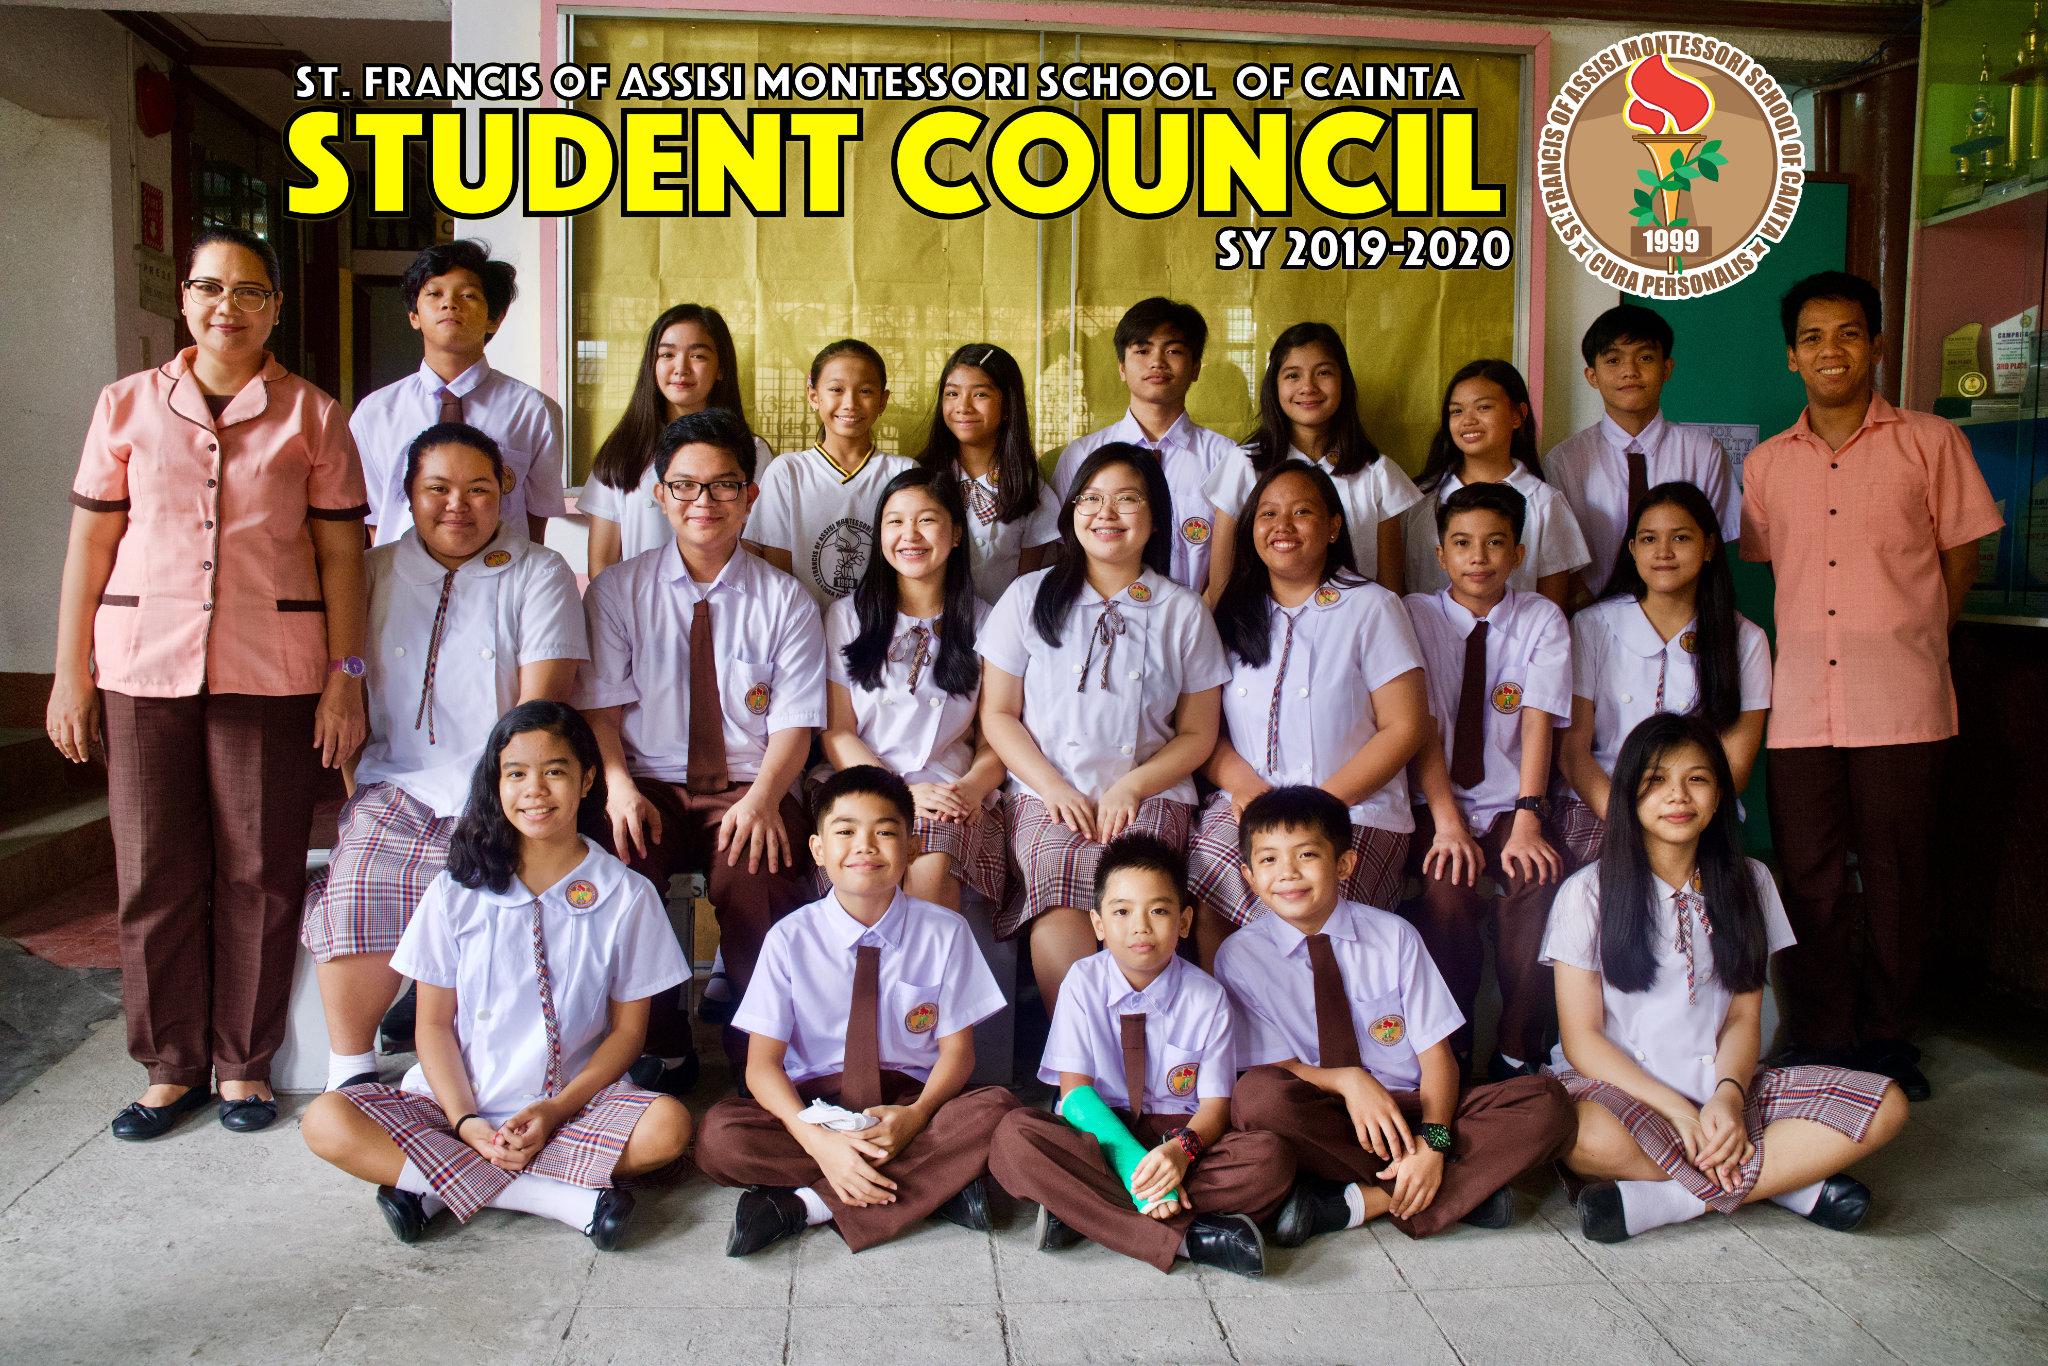 SFAMSC Student Council 2019.jpg